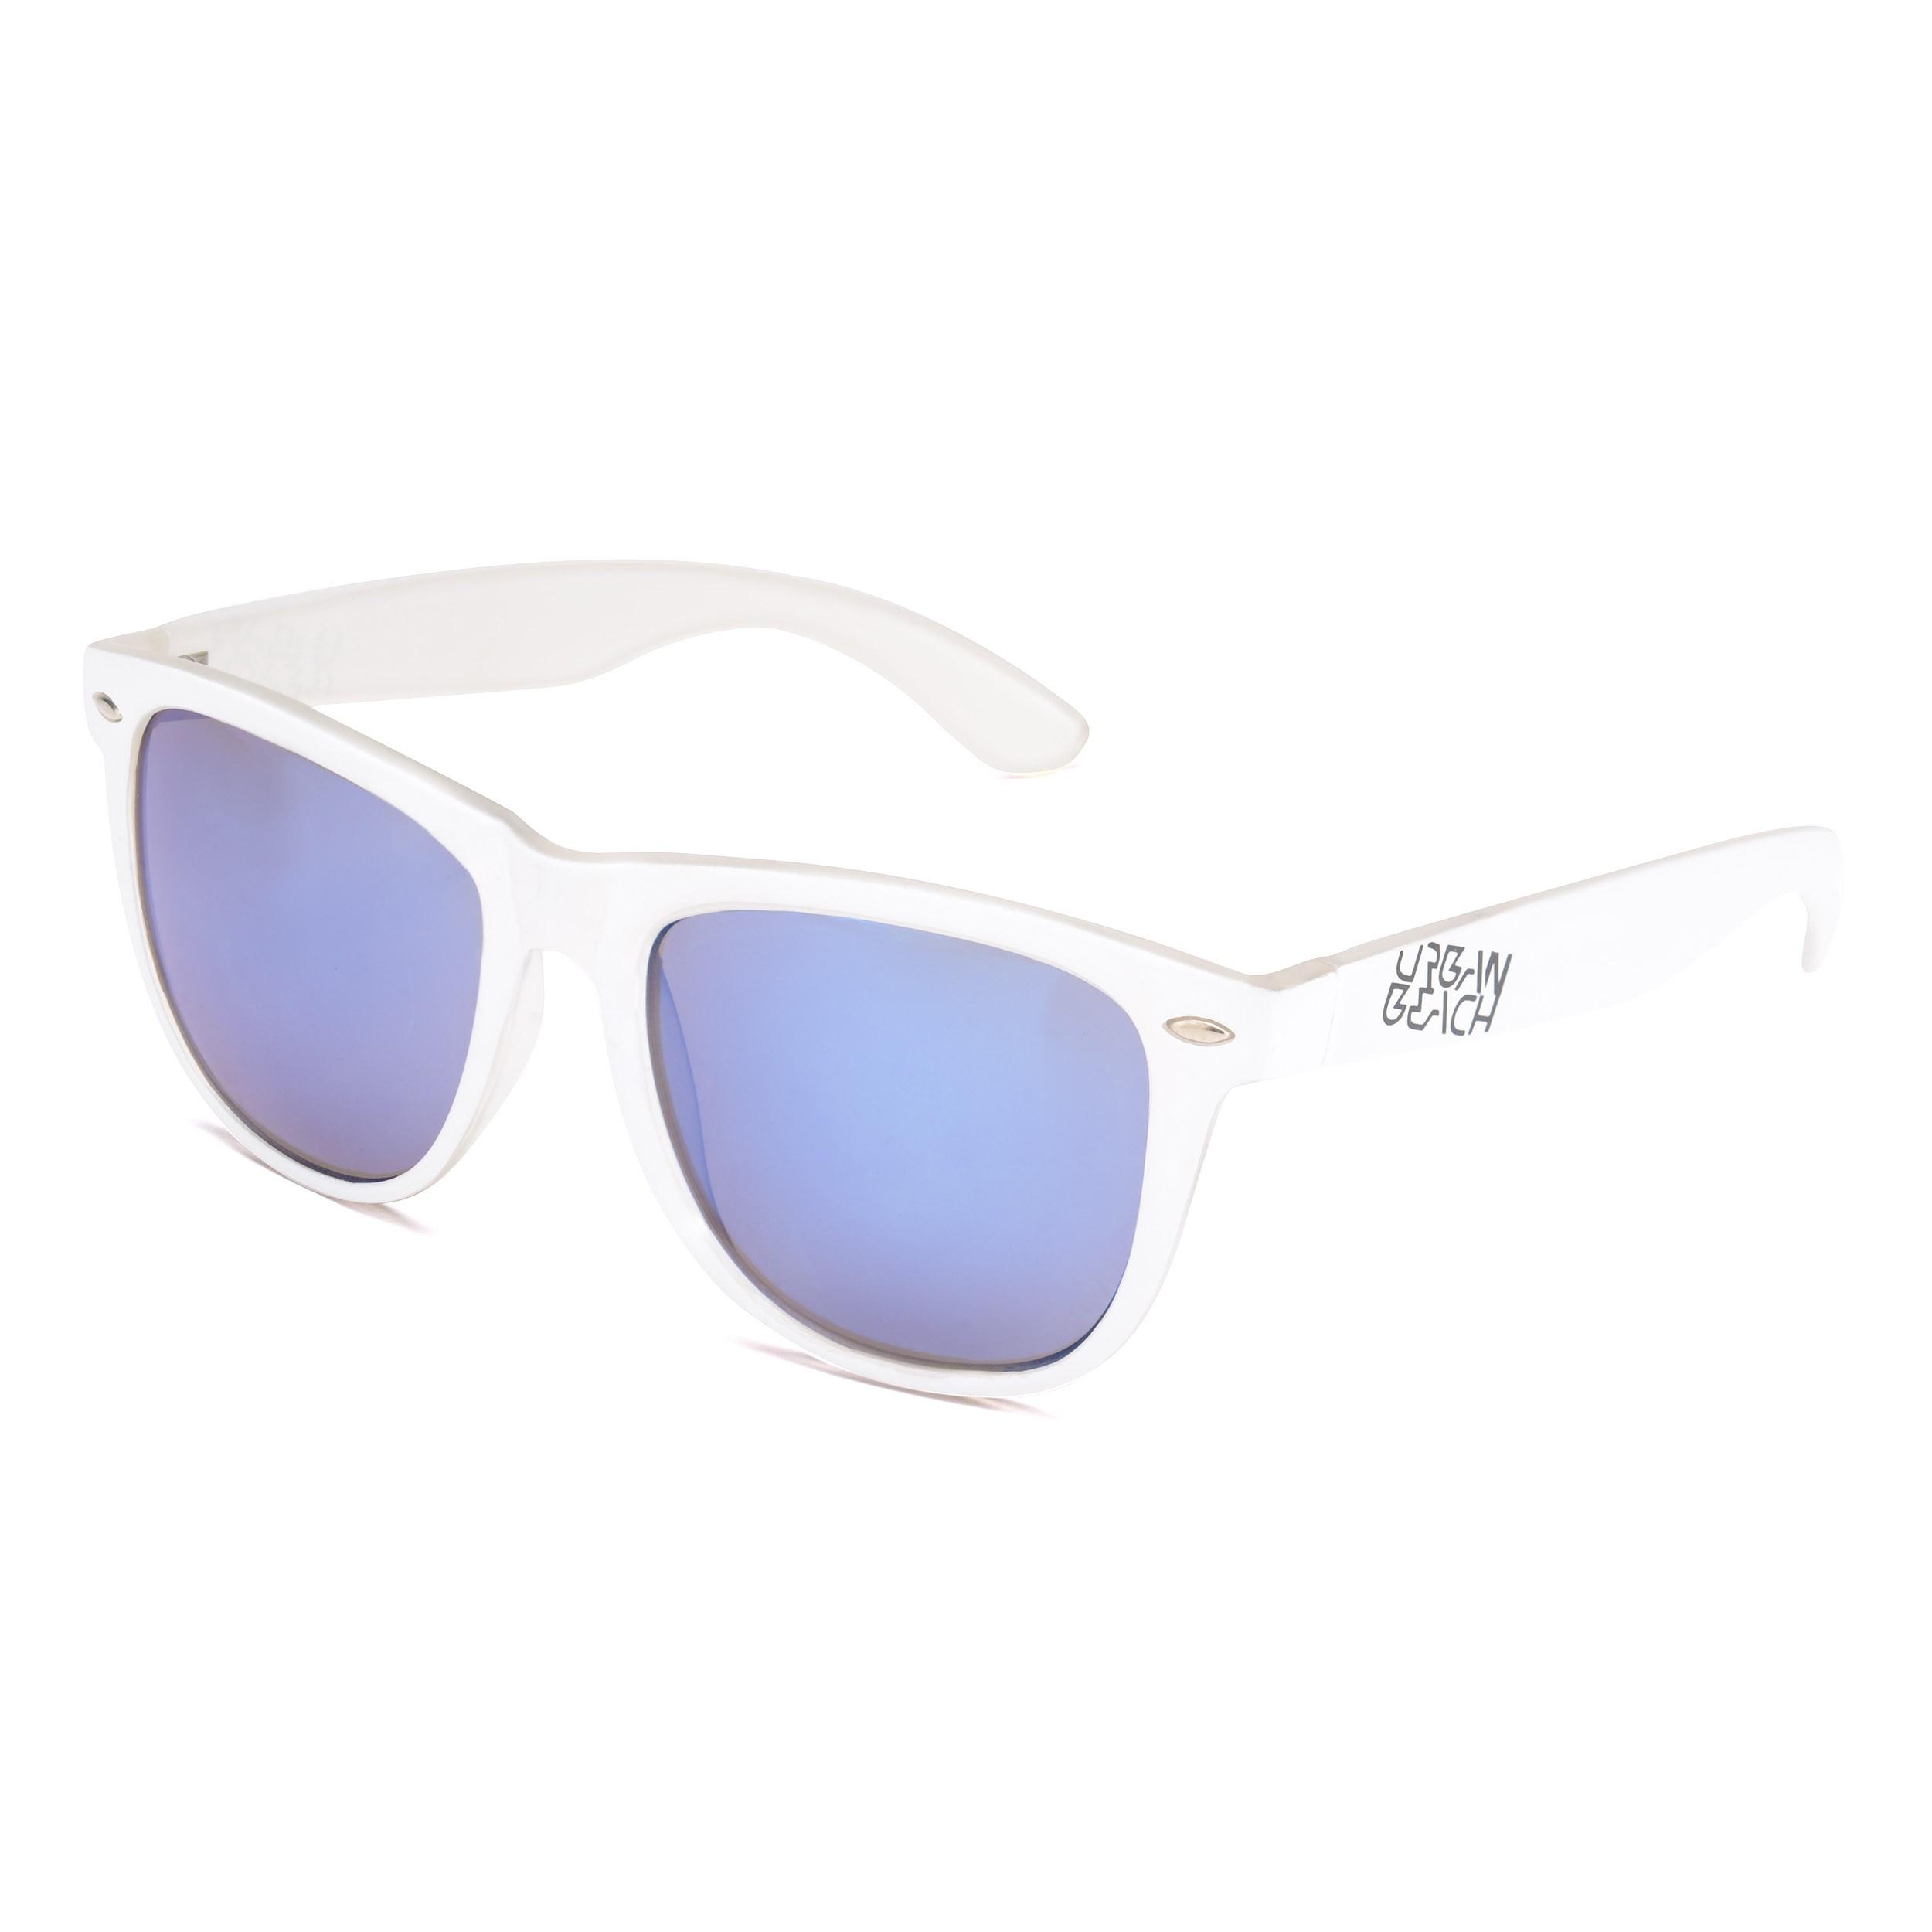 Unisex White Tron Sunglasses